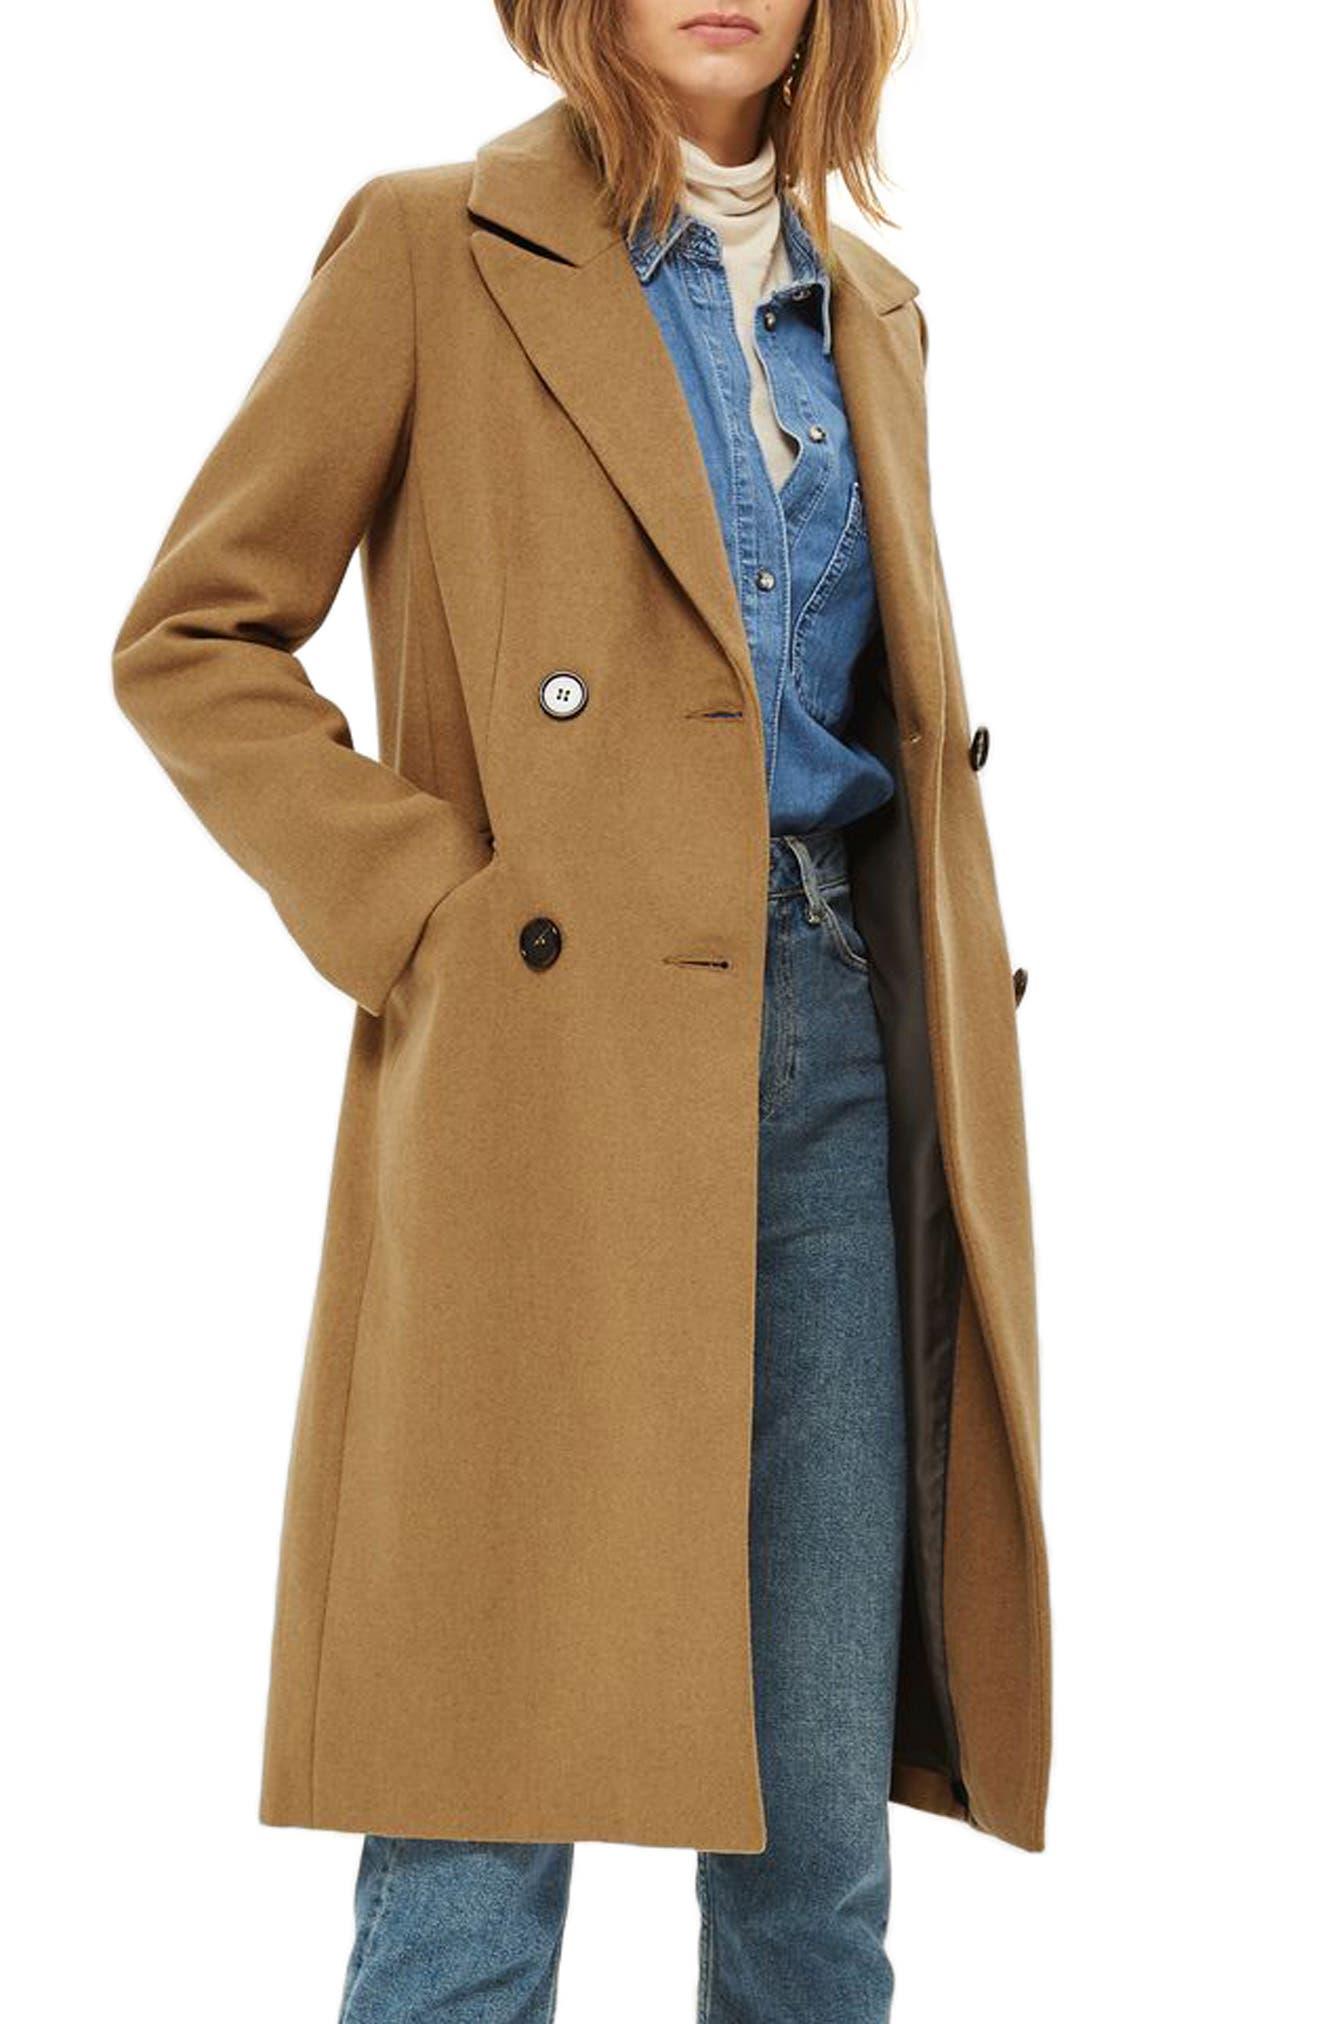 Editors Double Breasted Coat,                             Main thumbnail 1, color,